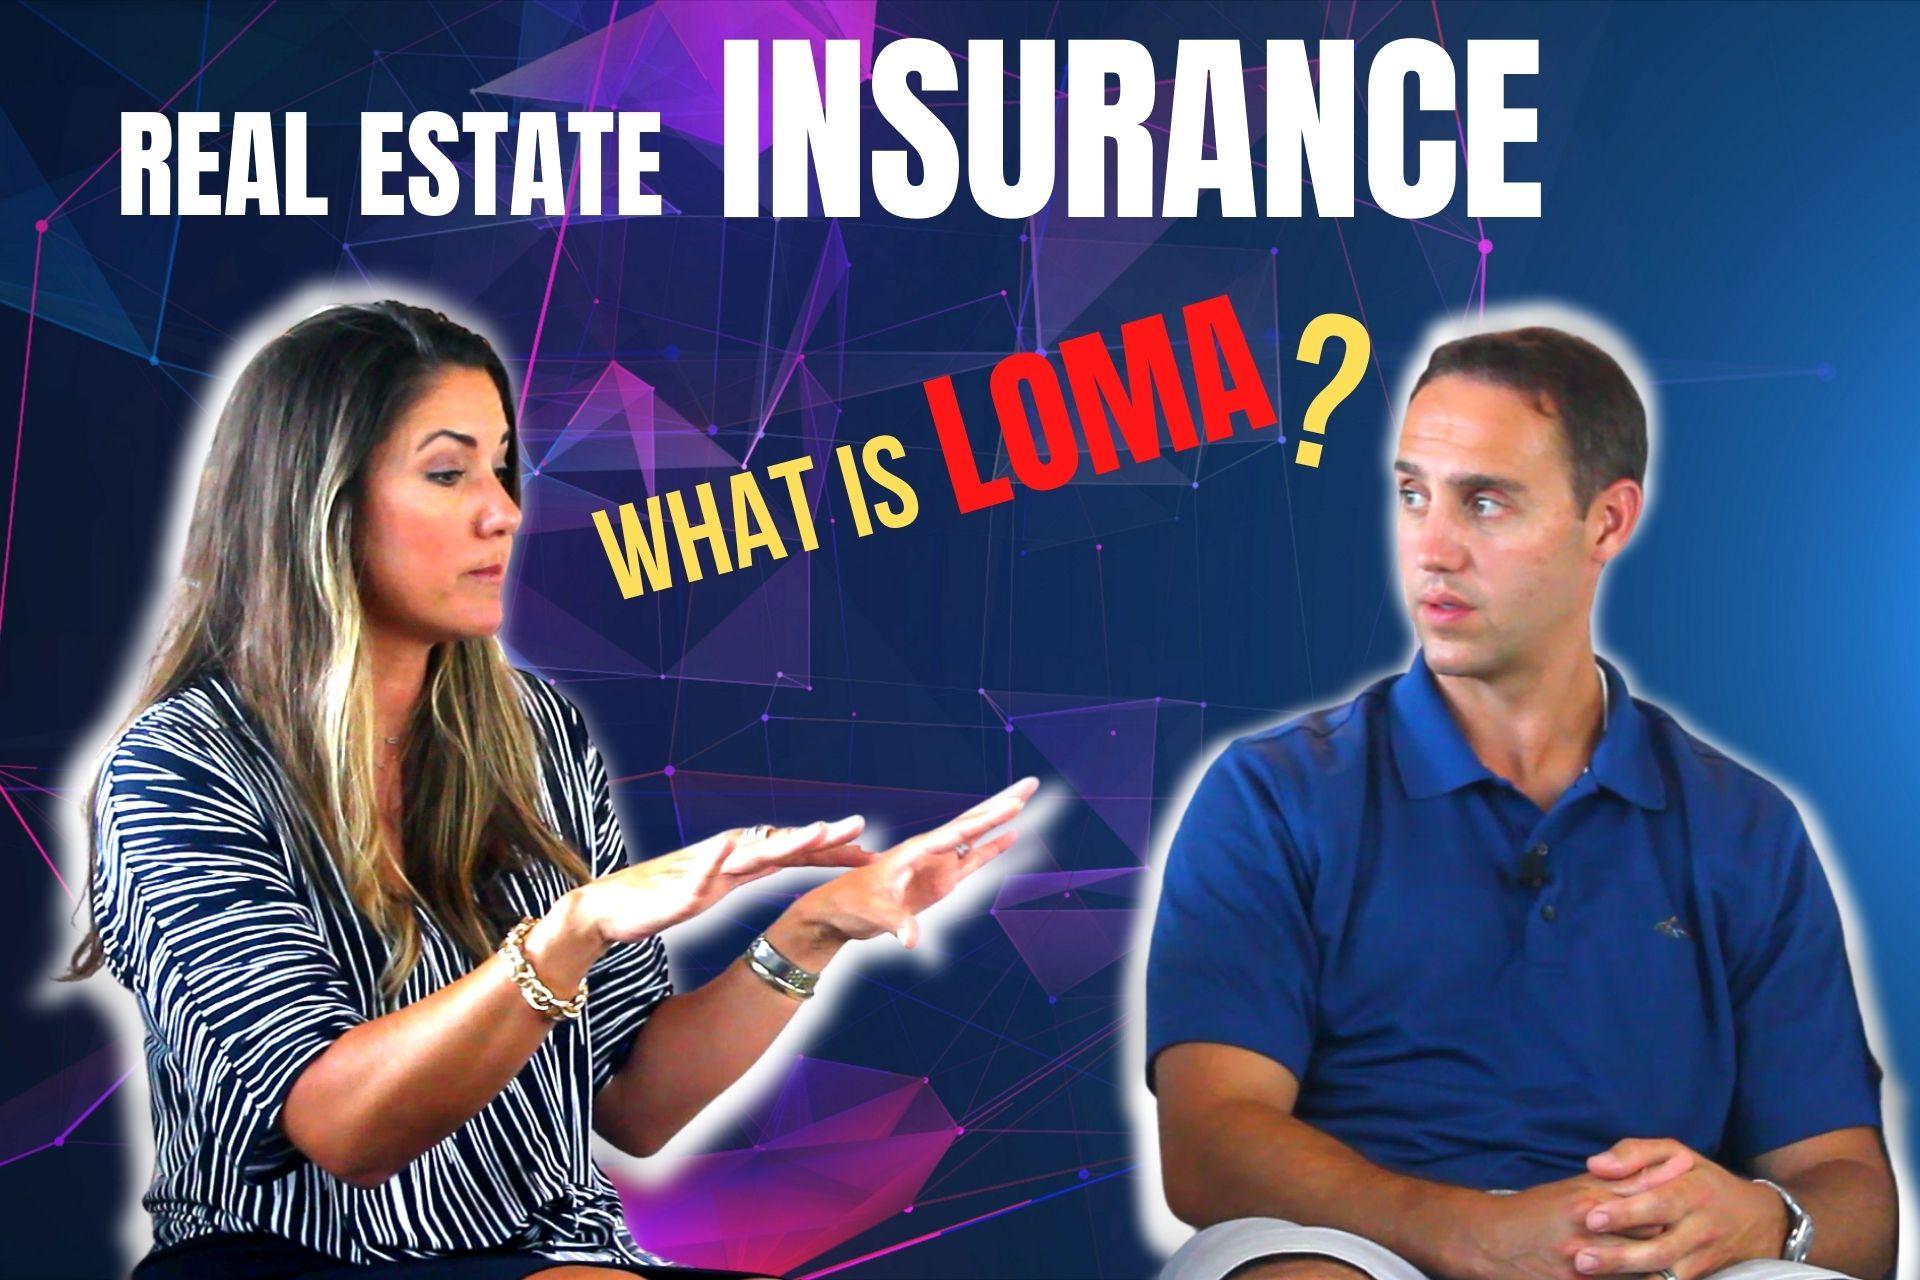 LOMA Insurance - Interview with Kara Herring